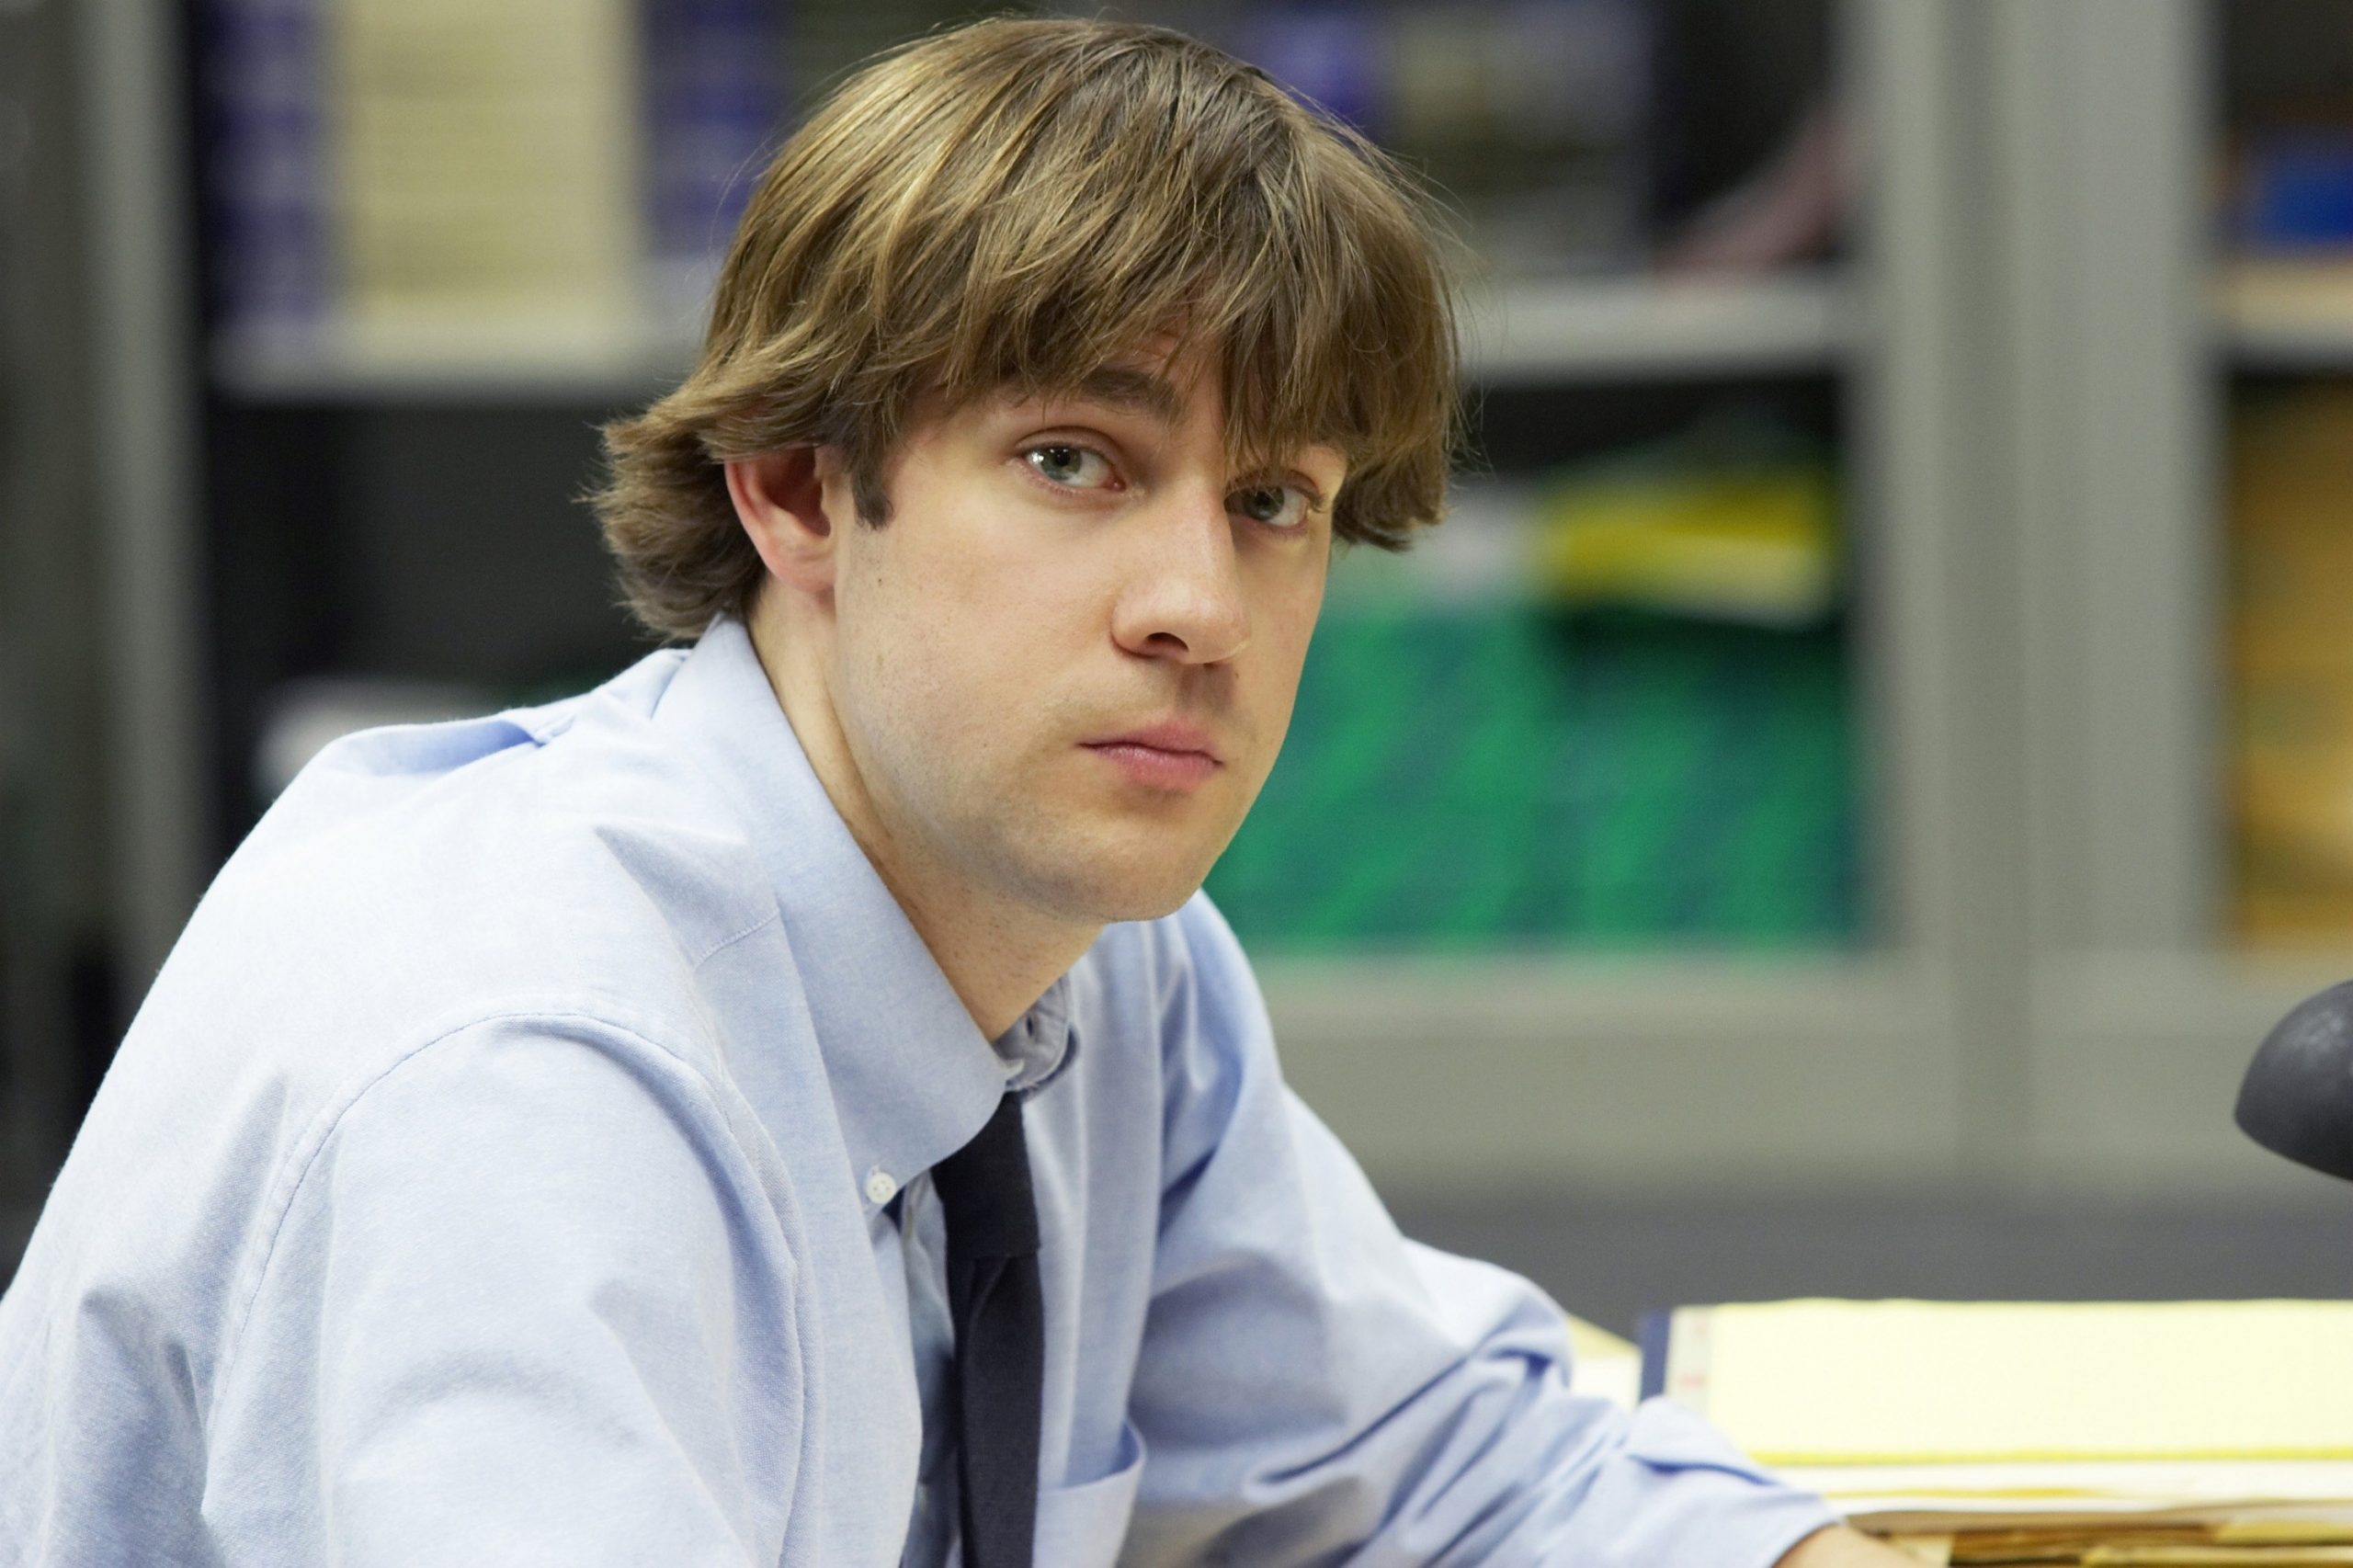 John Krasinski as Jim Halpert in 'The Office' Season 1